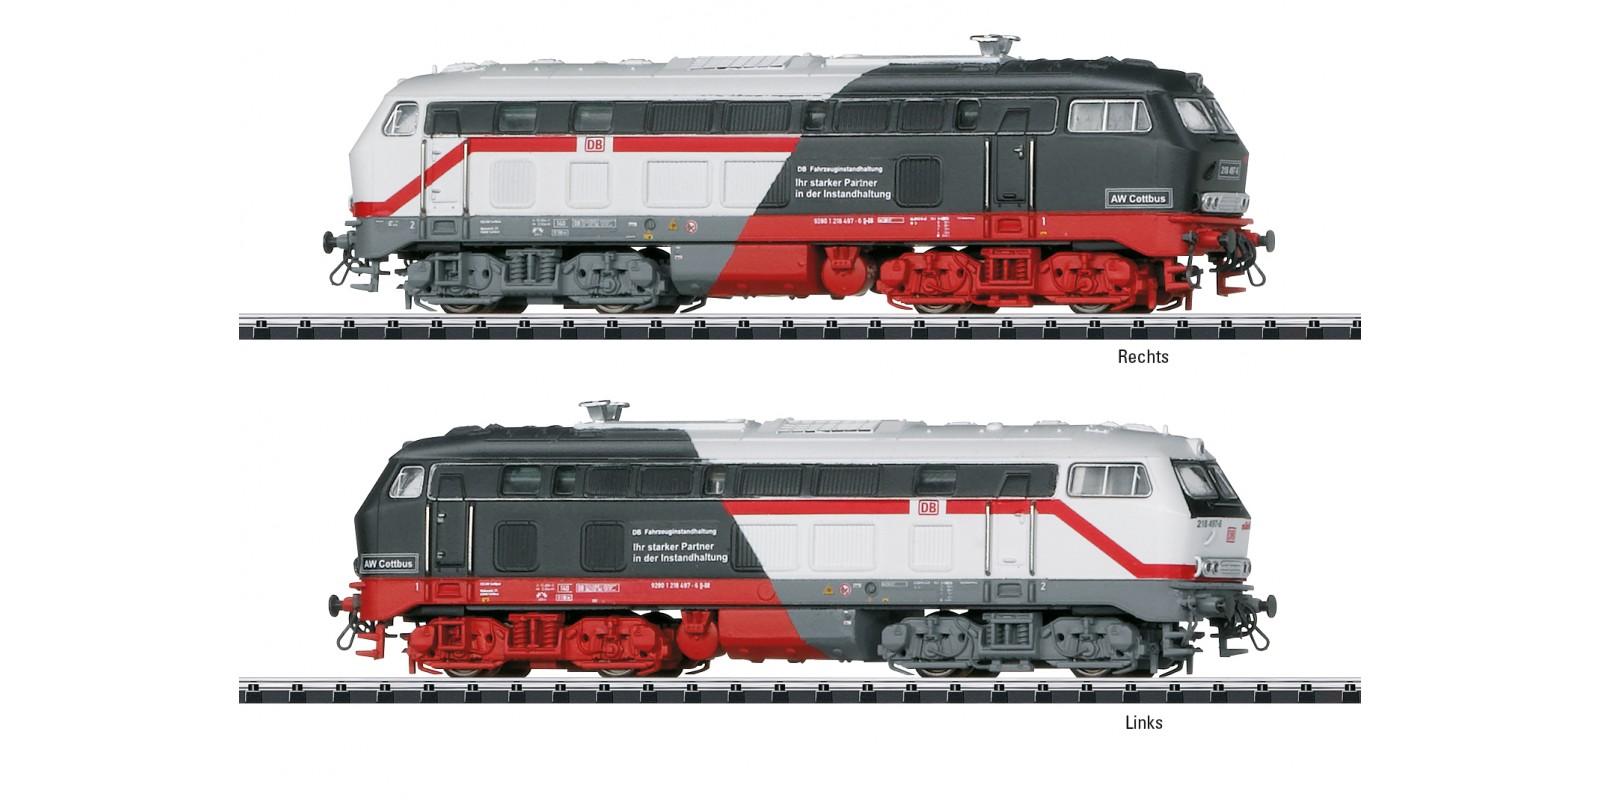 T16825 Class 218 Diesel Locomotive